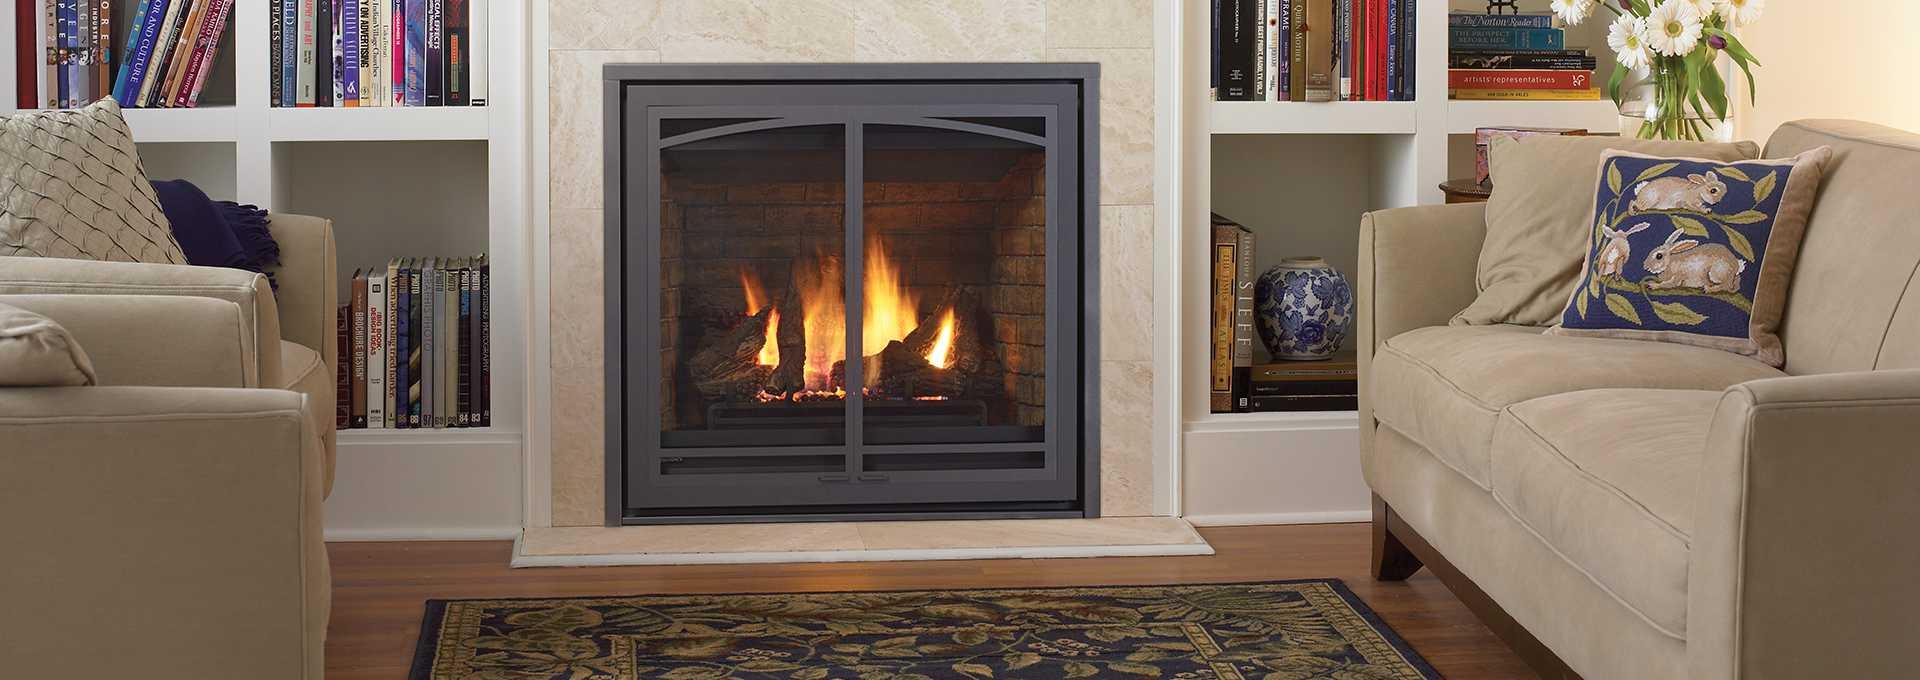 bellavista b36xte gas fireplace gas fireplaces regency